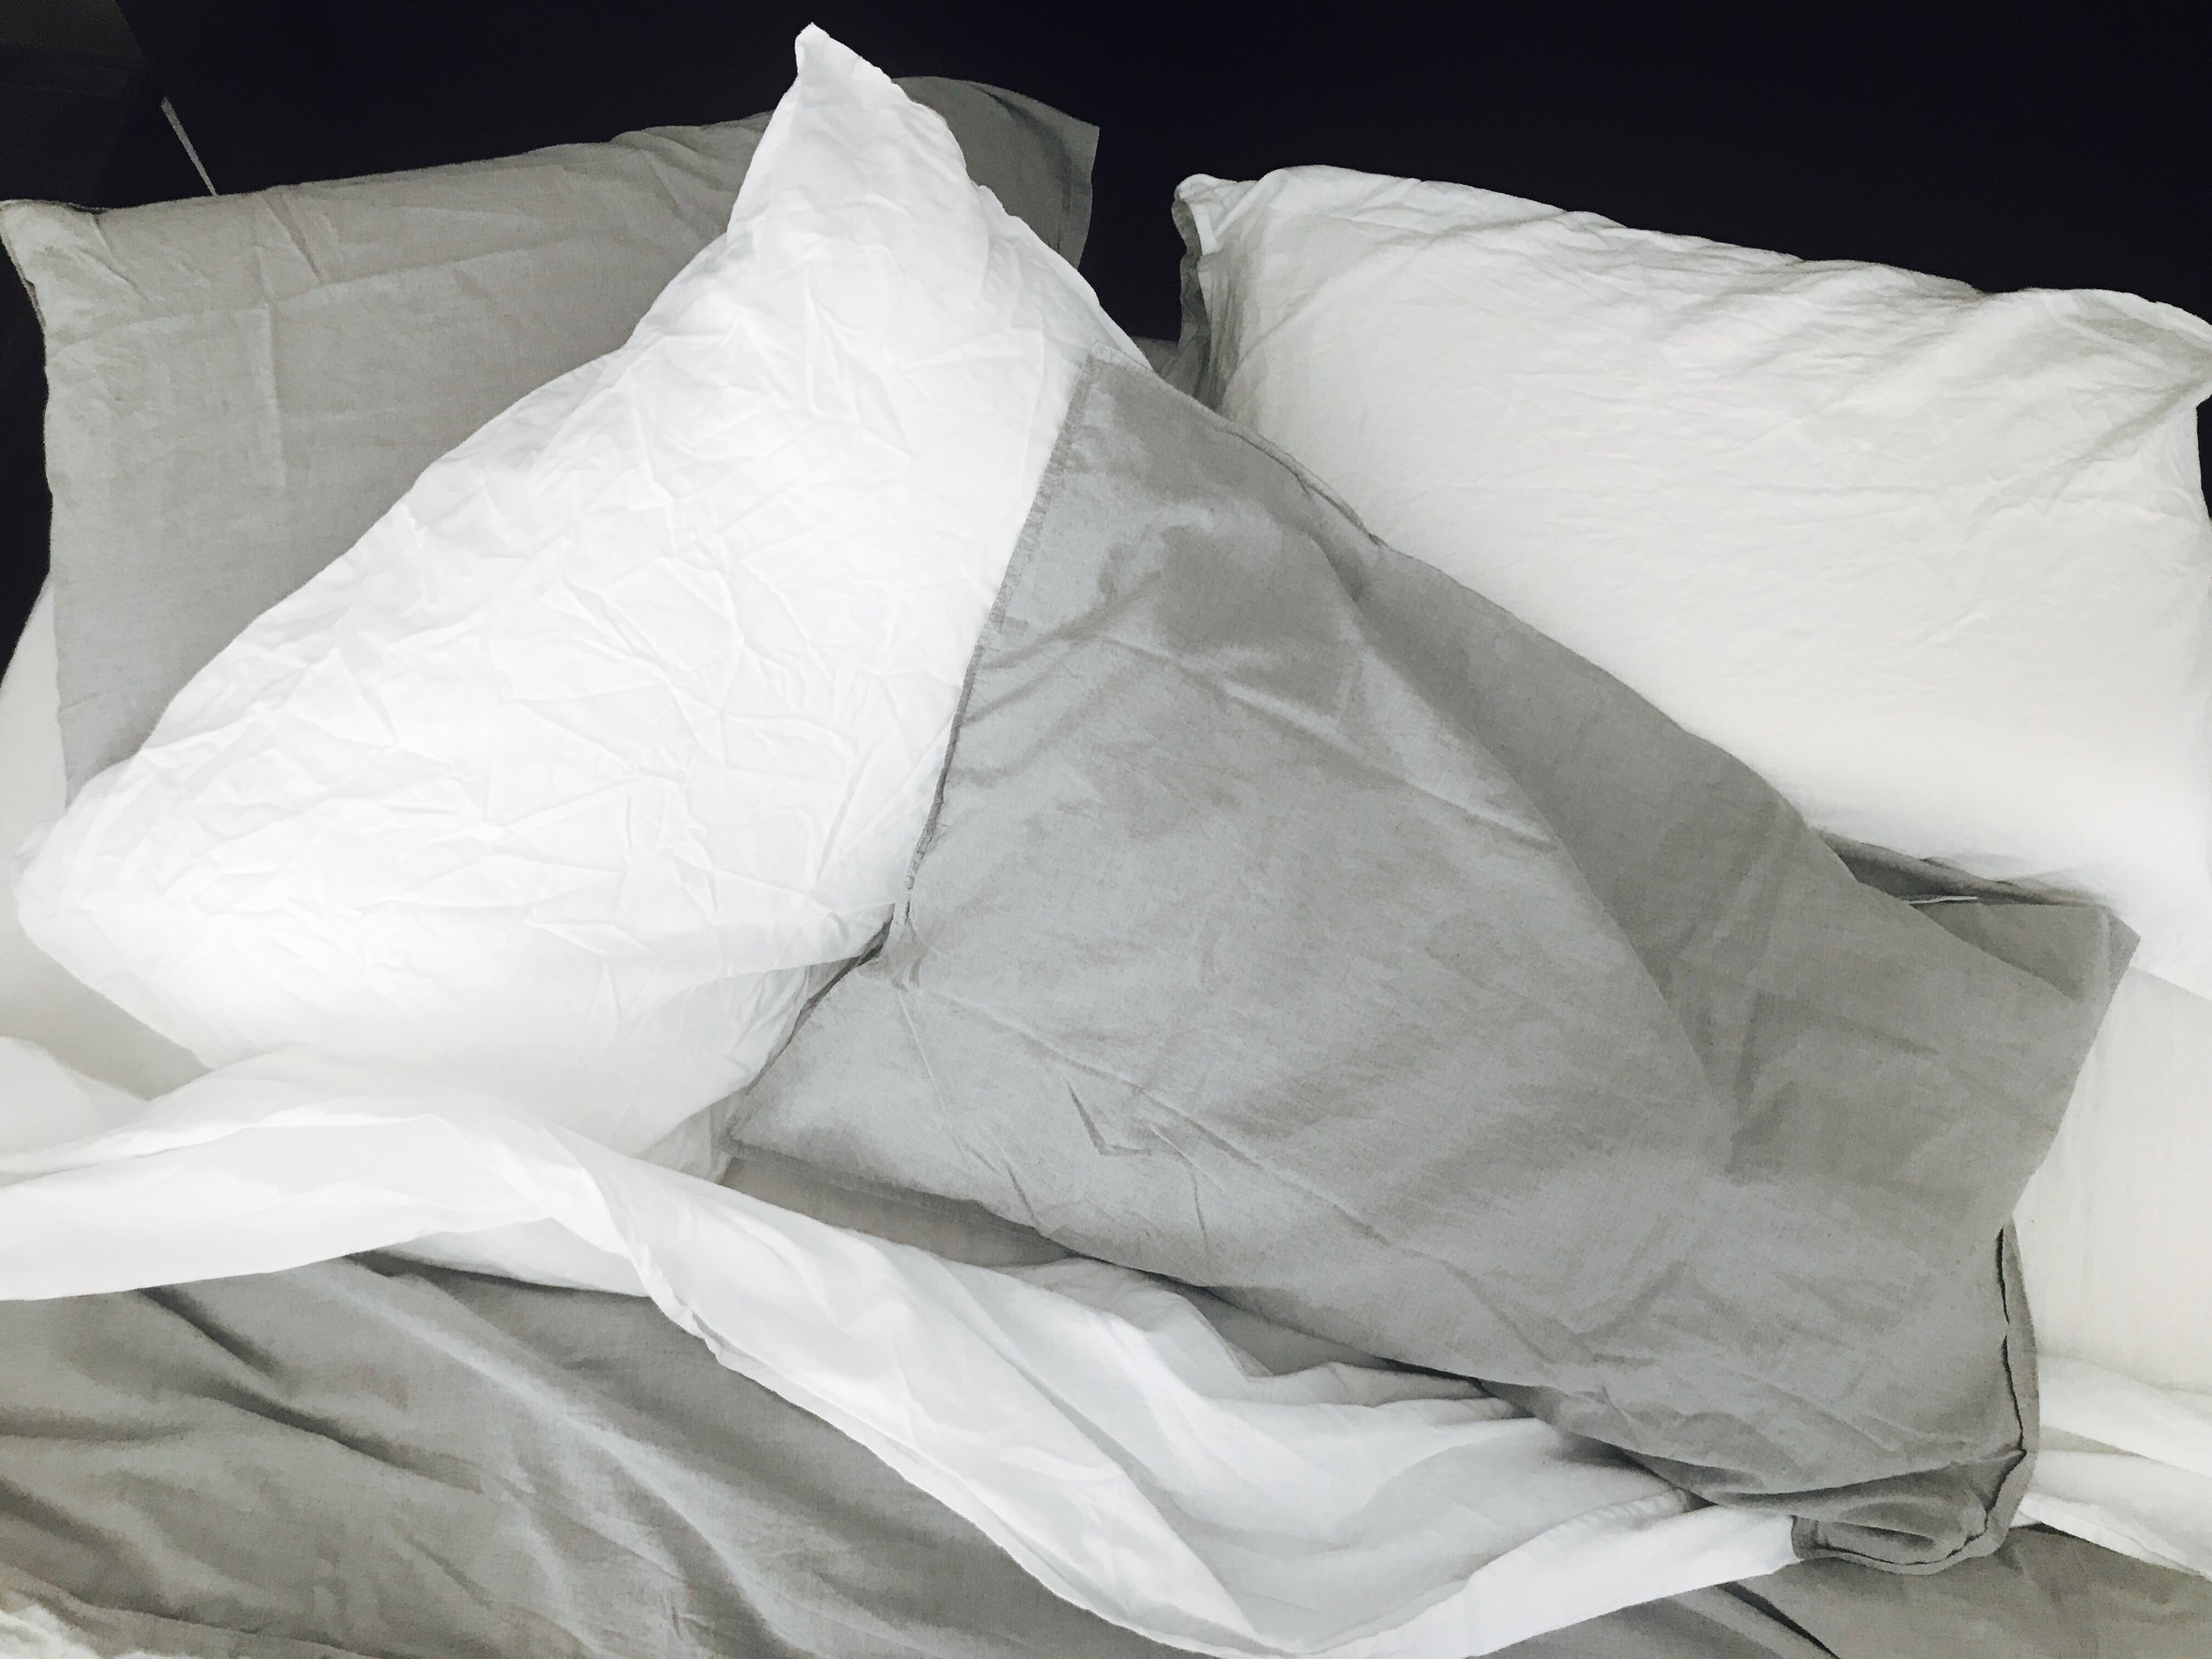 interior-decorating-pillows-Liz-Hayward.jpg